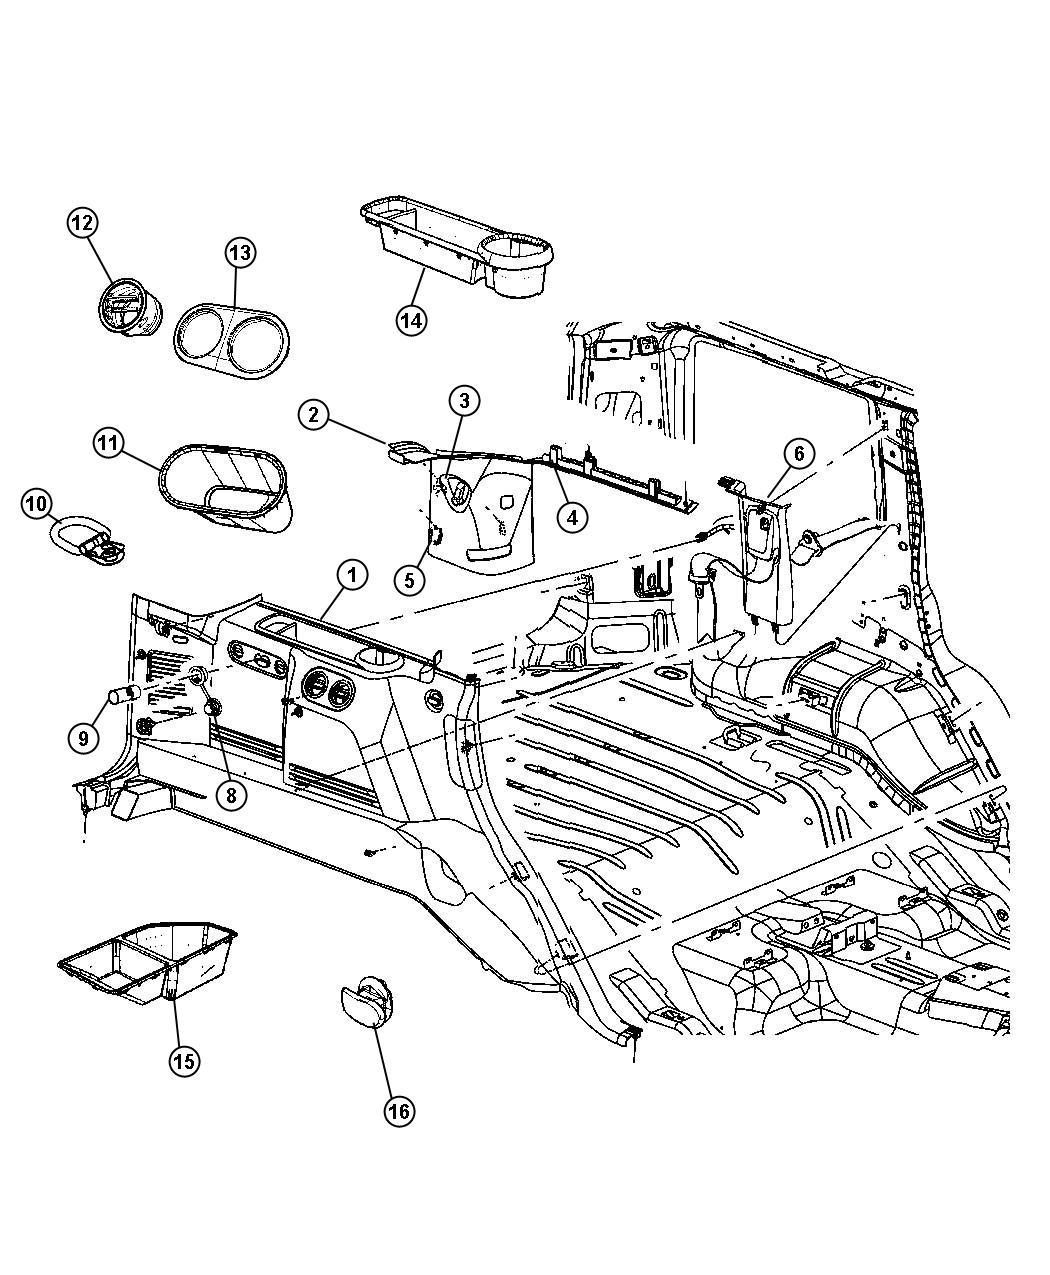 Jeep Commander Cupholder. Right. [dv]. Trim: [all trim